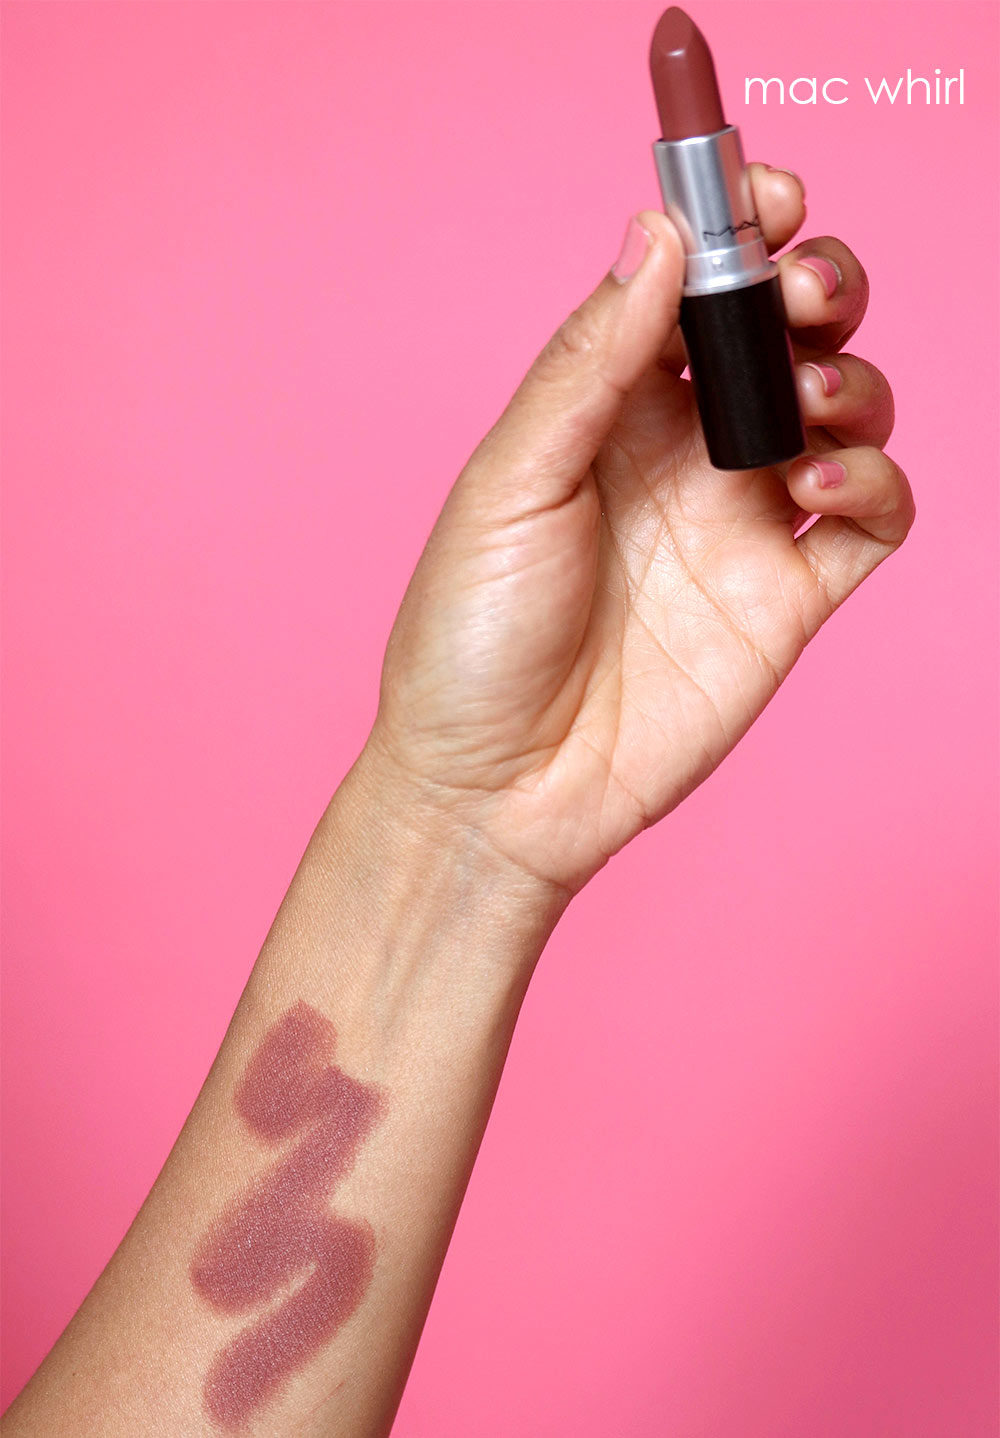 mac whirl lipstick swatch